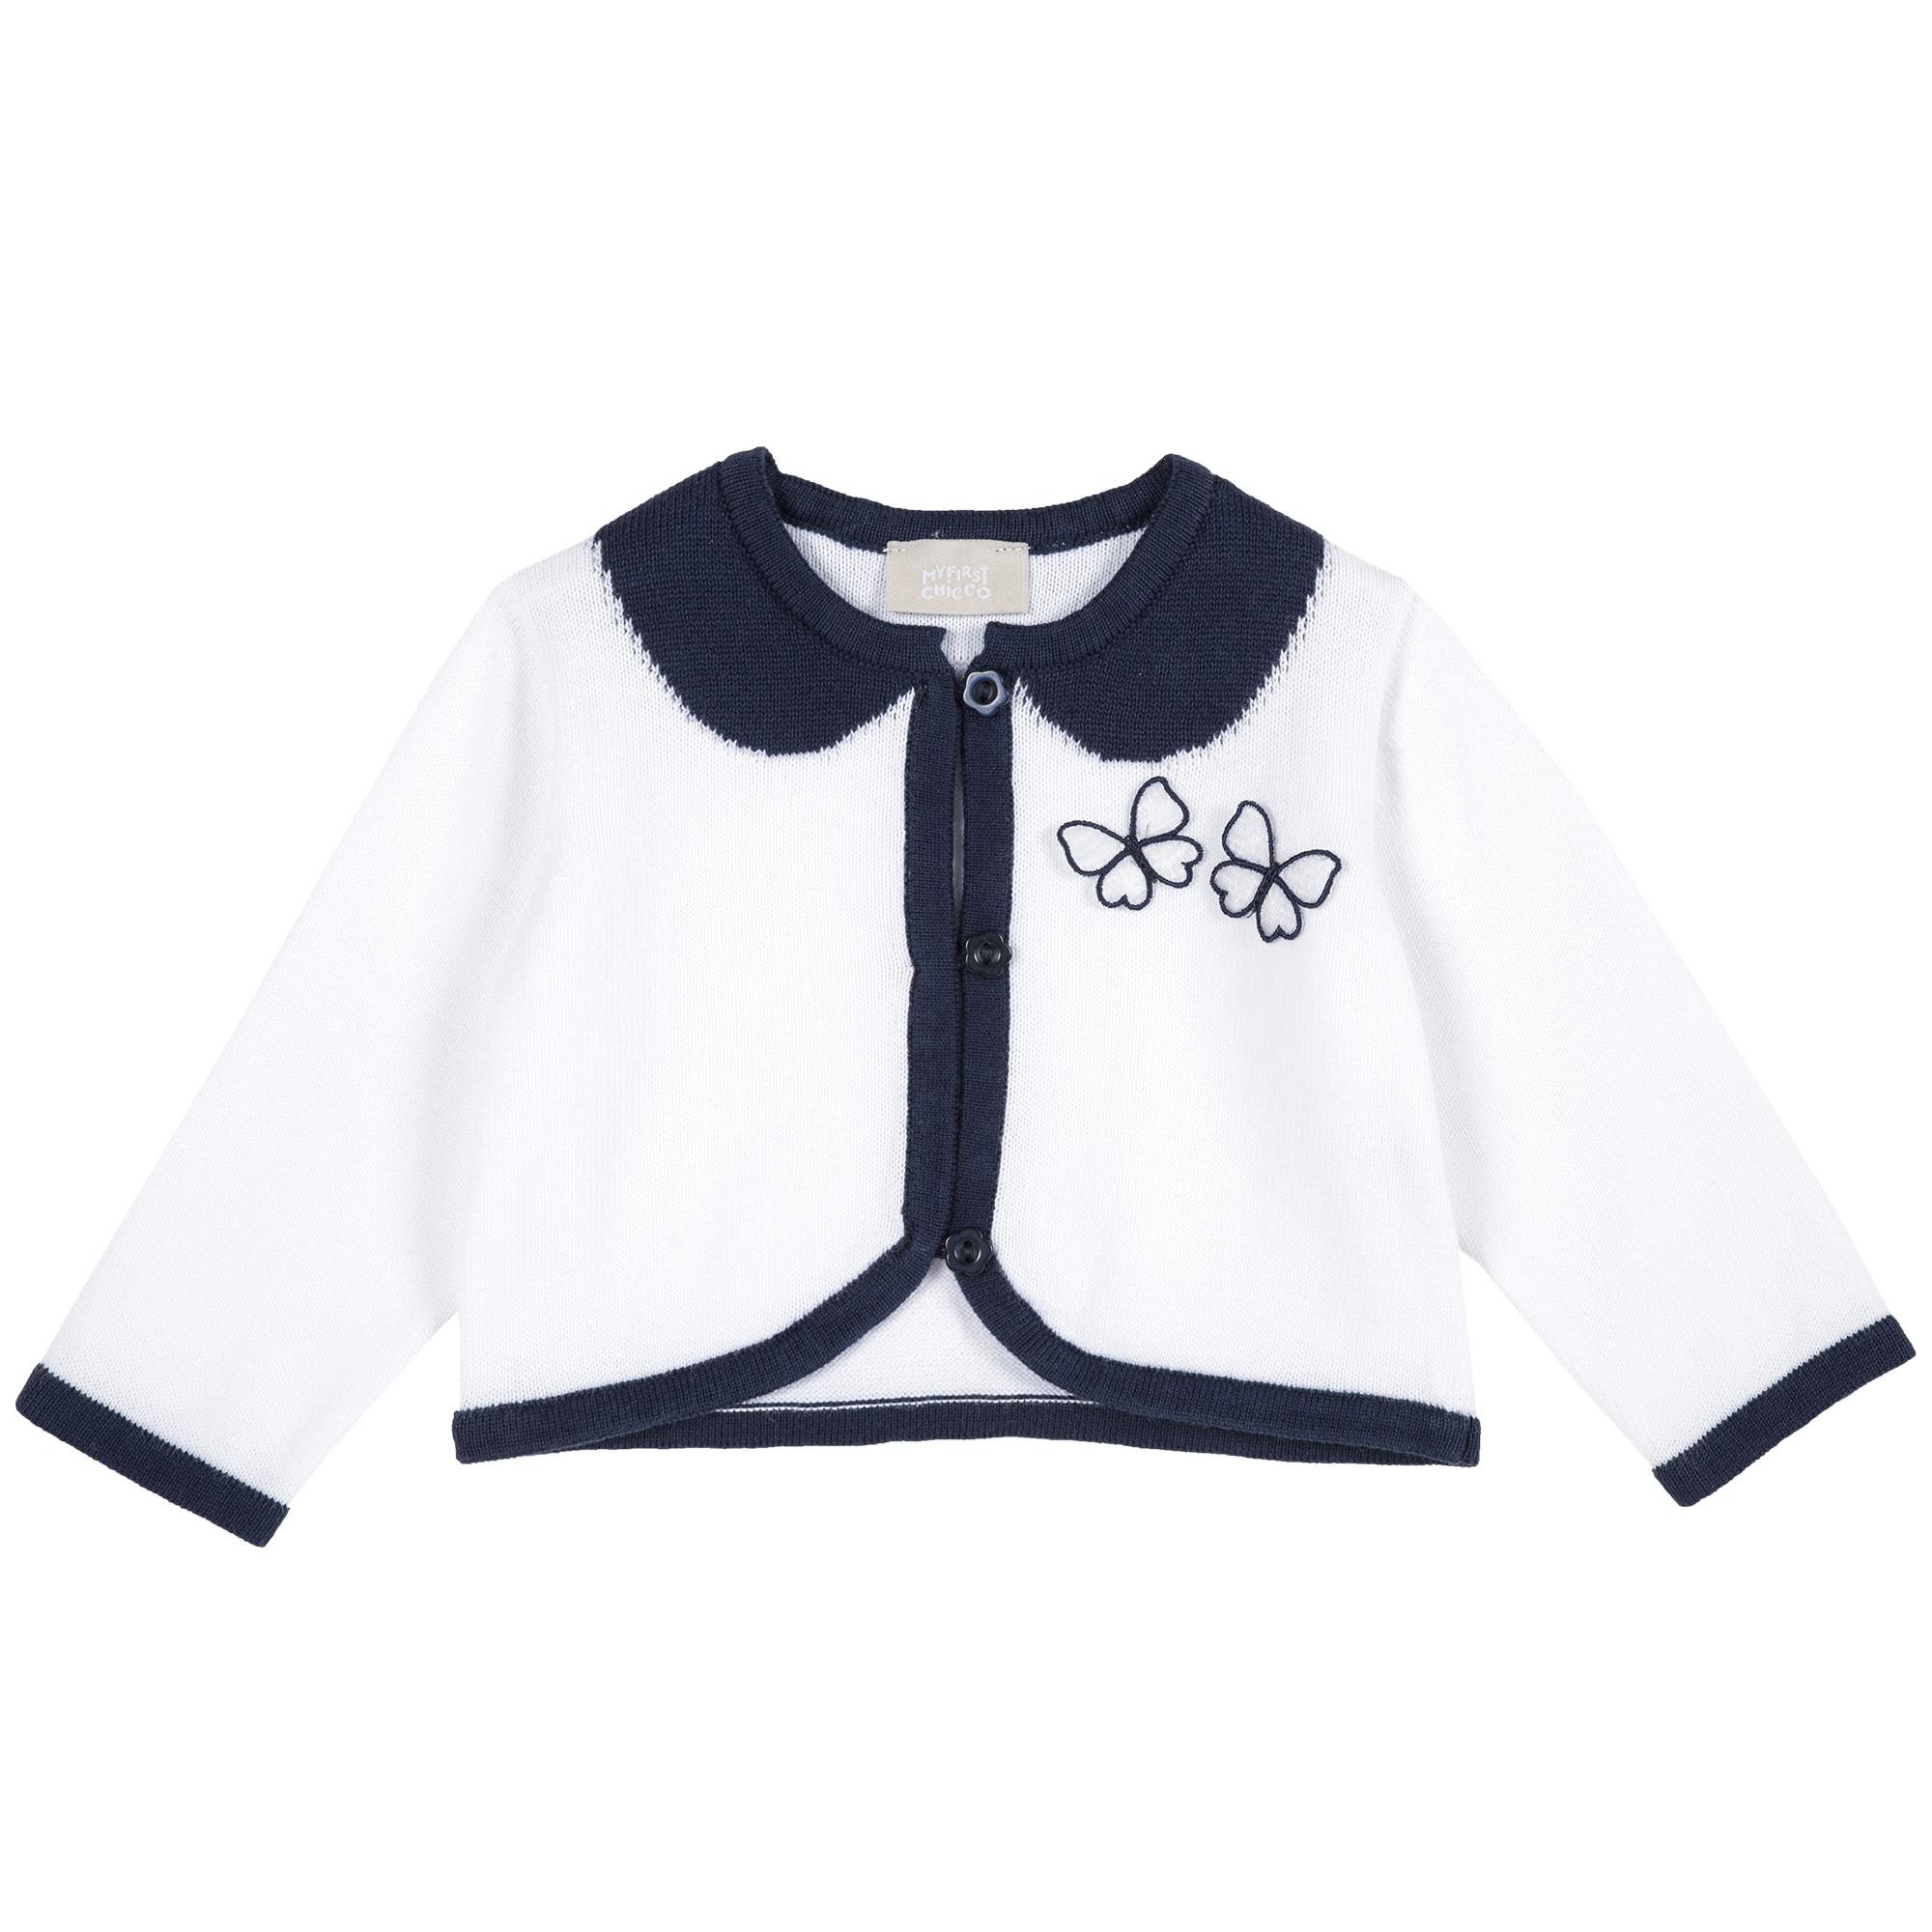 Cardigan copii Chicco, tricotat, alb cu bleumarin, 96803 din categoria Cardigan copii